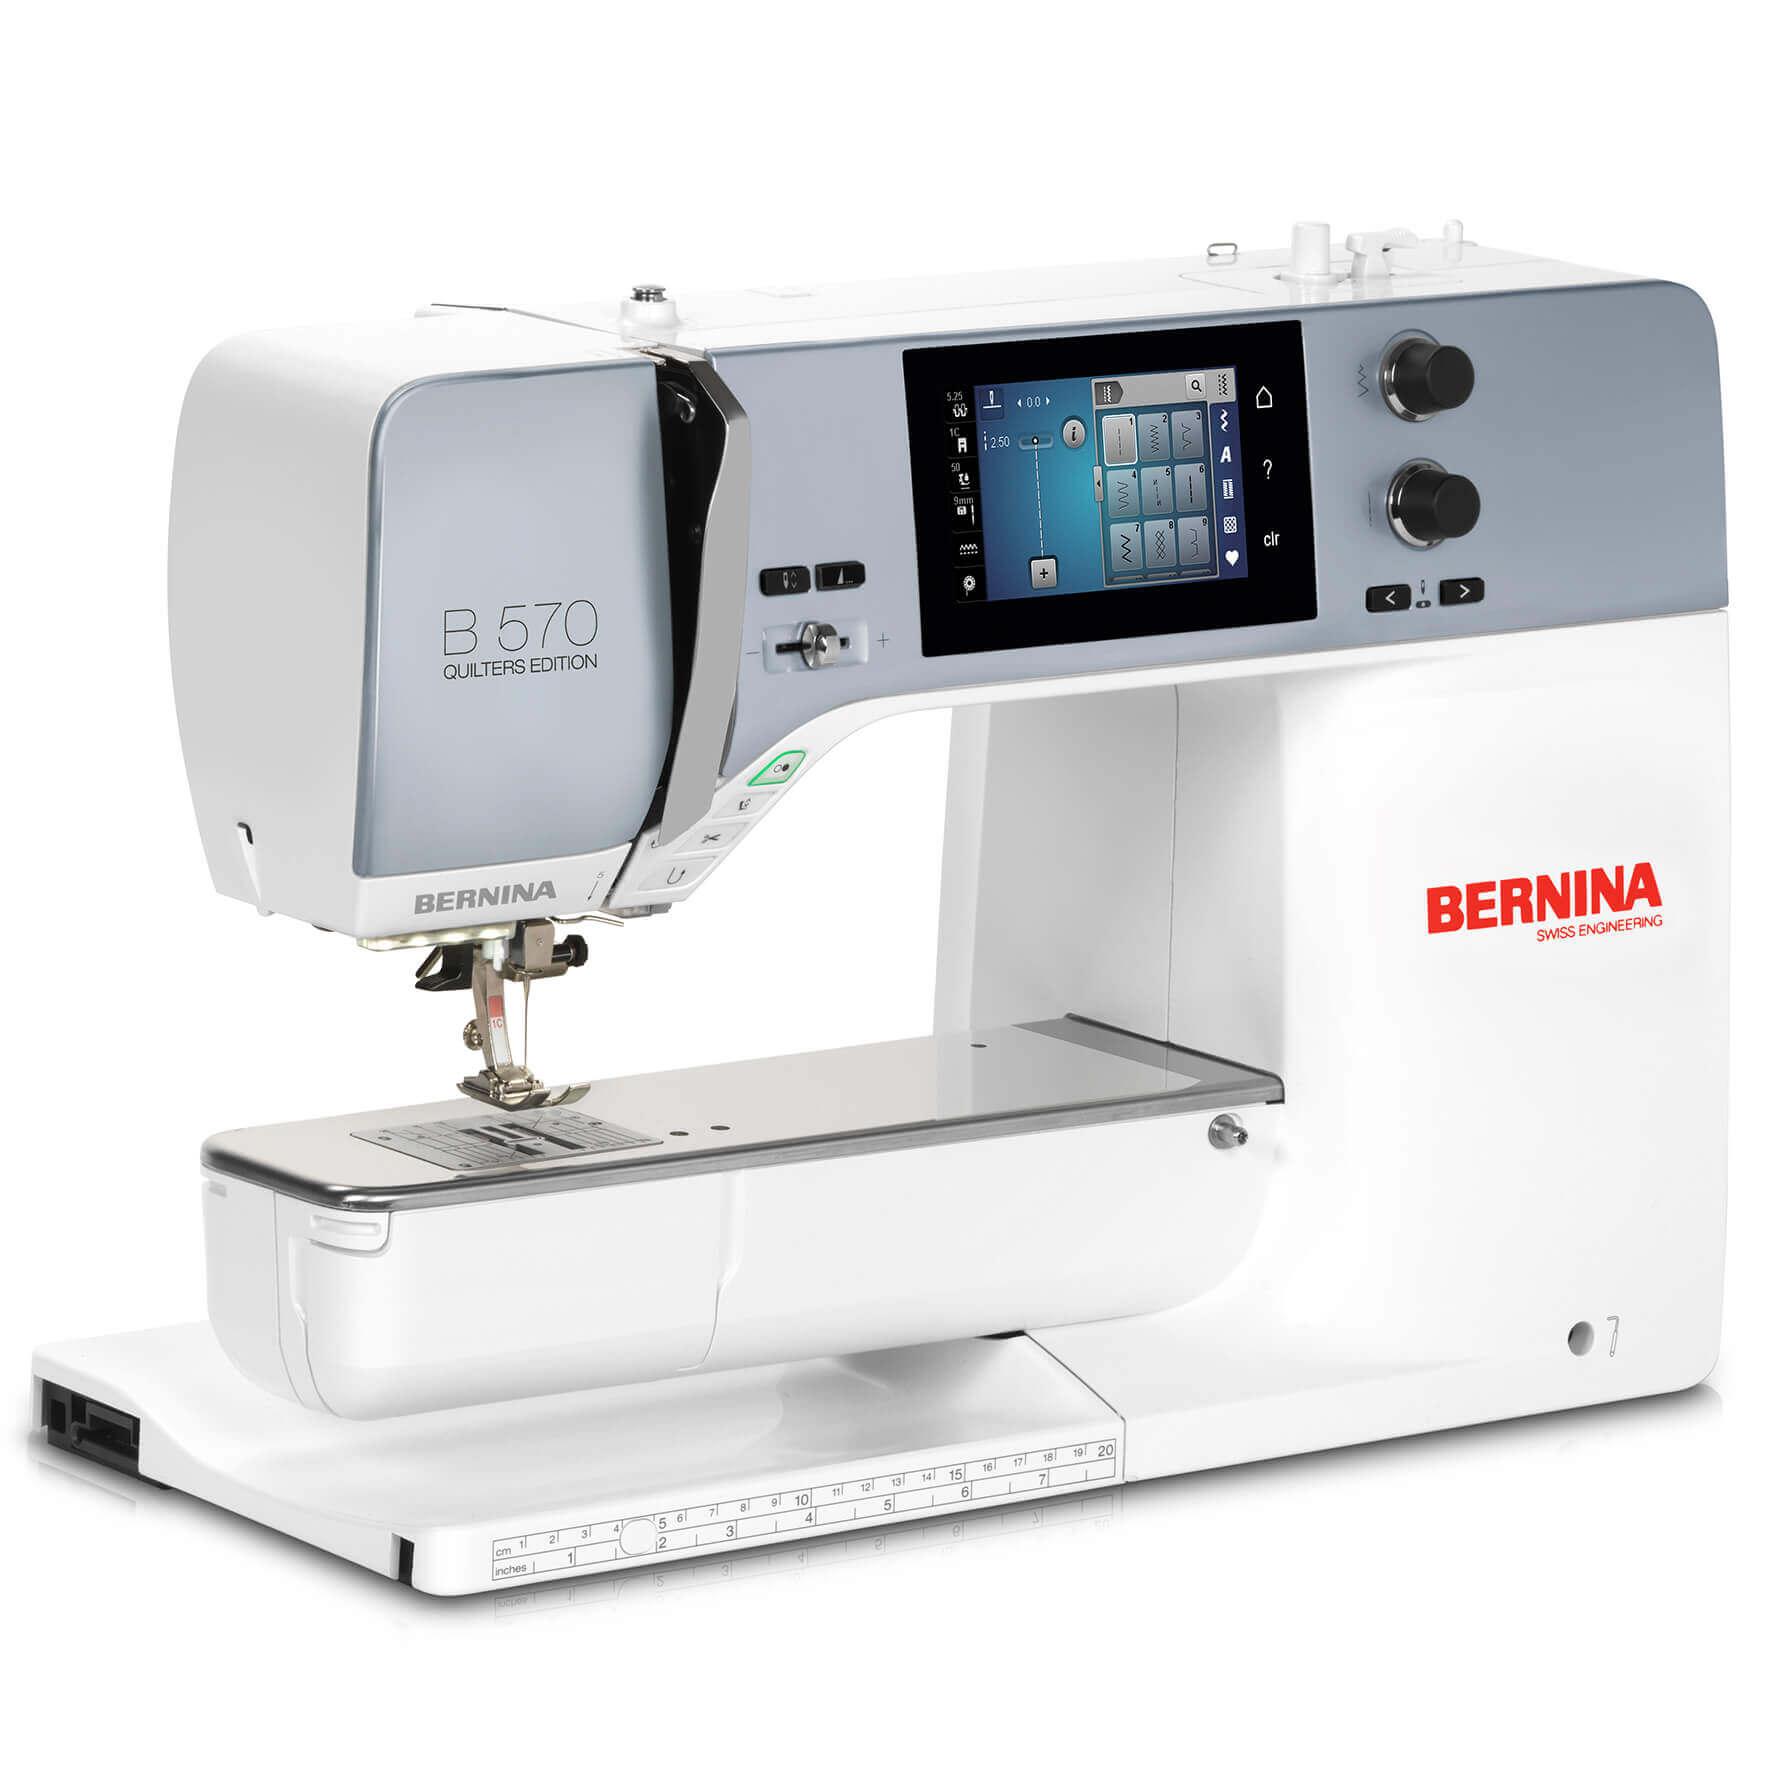 The New Bernina 570QE